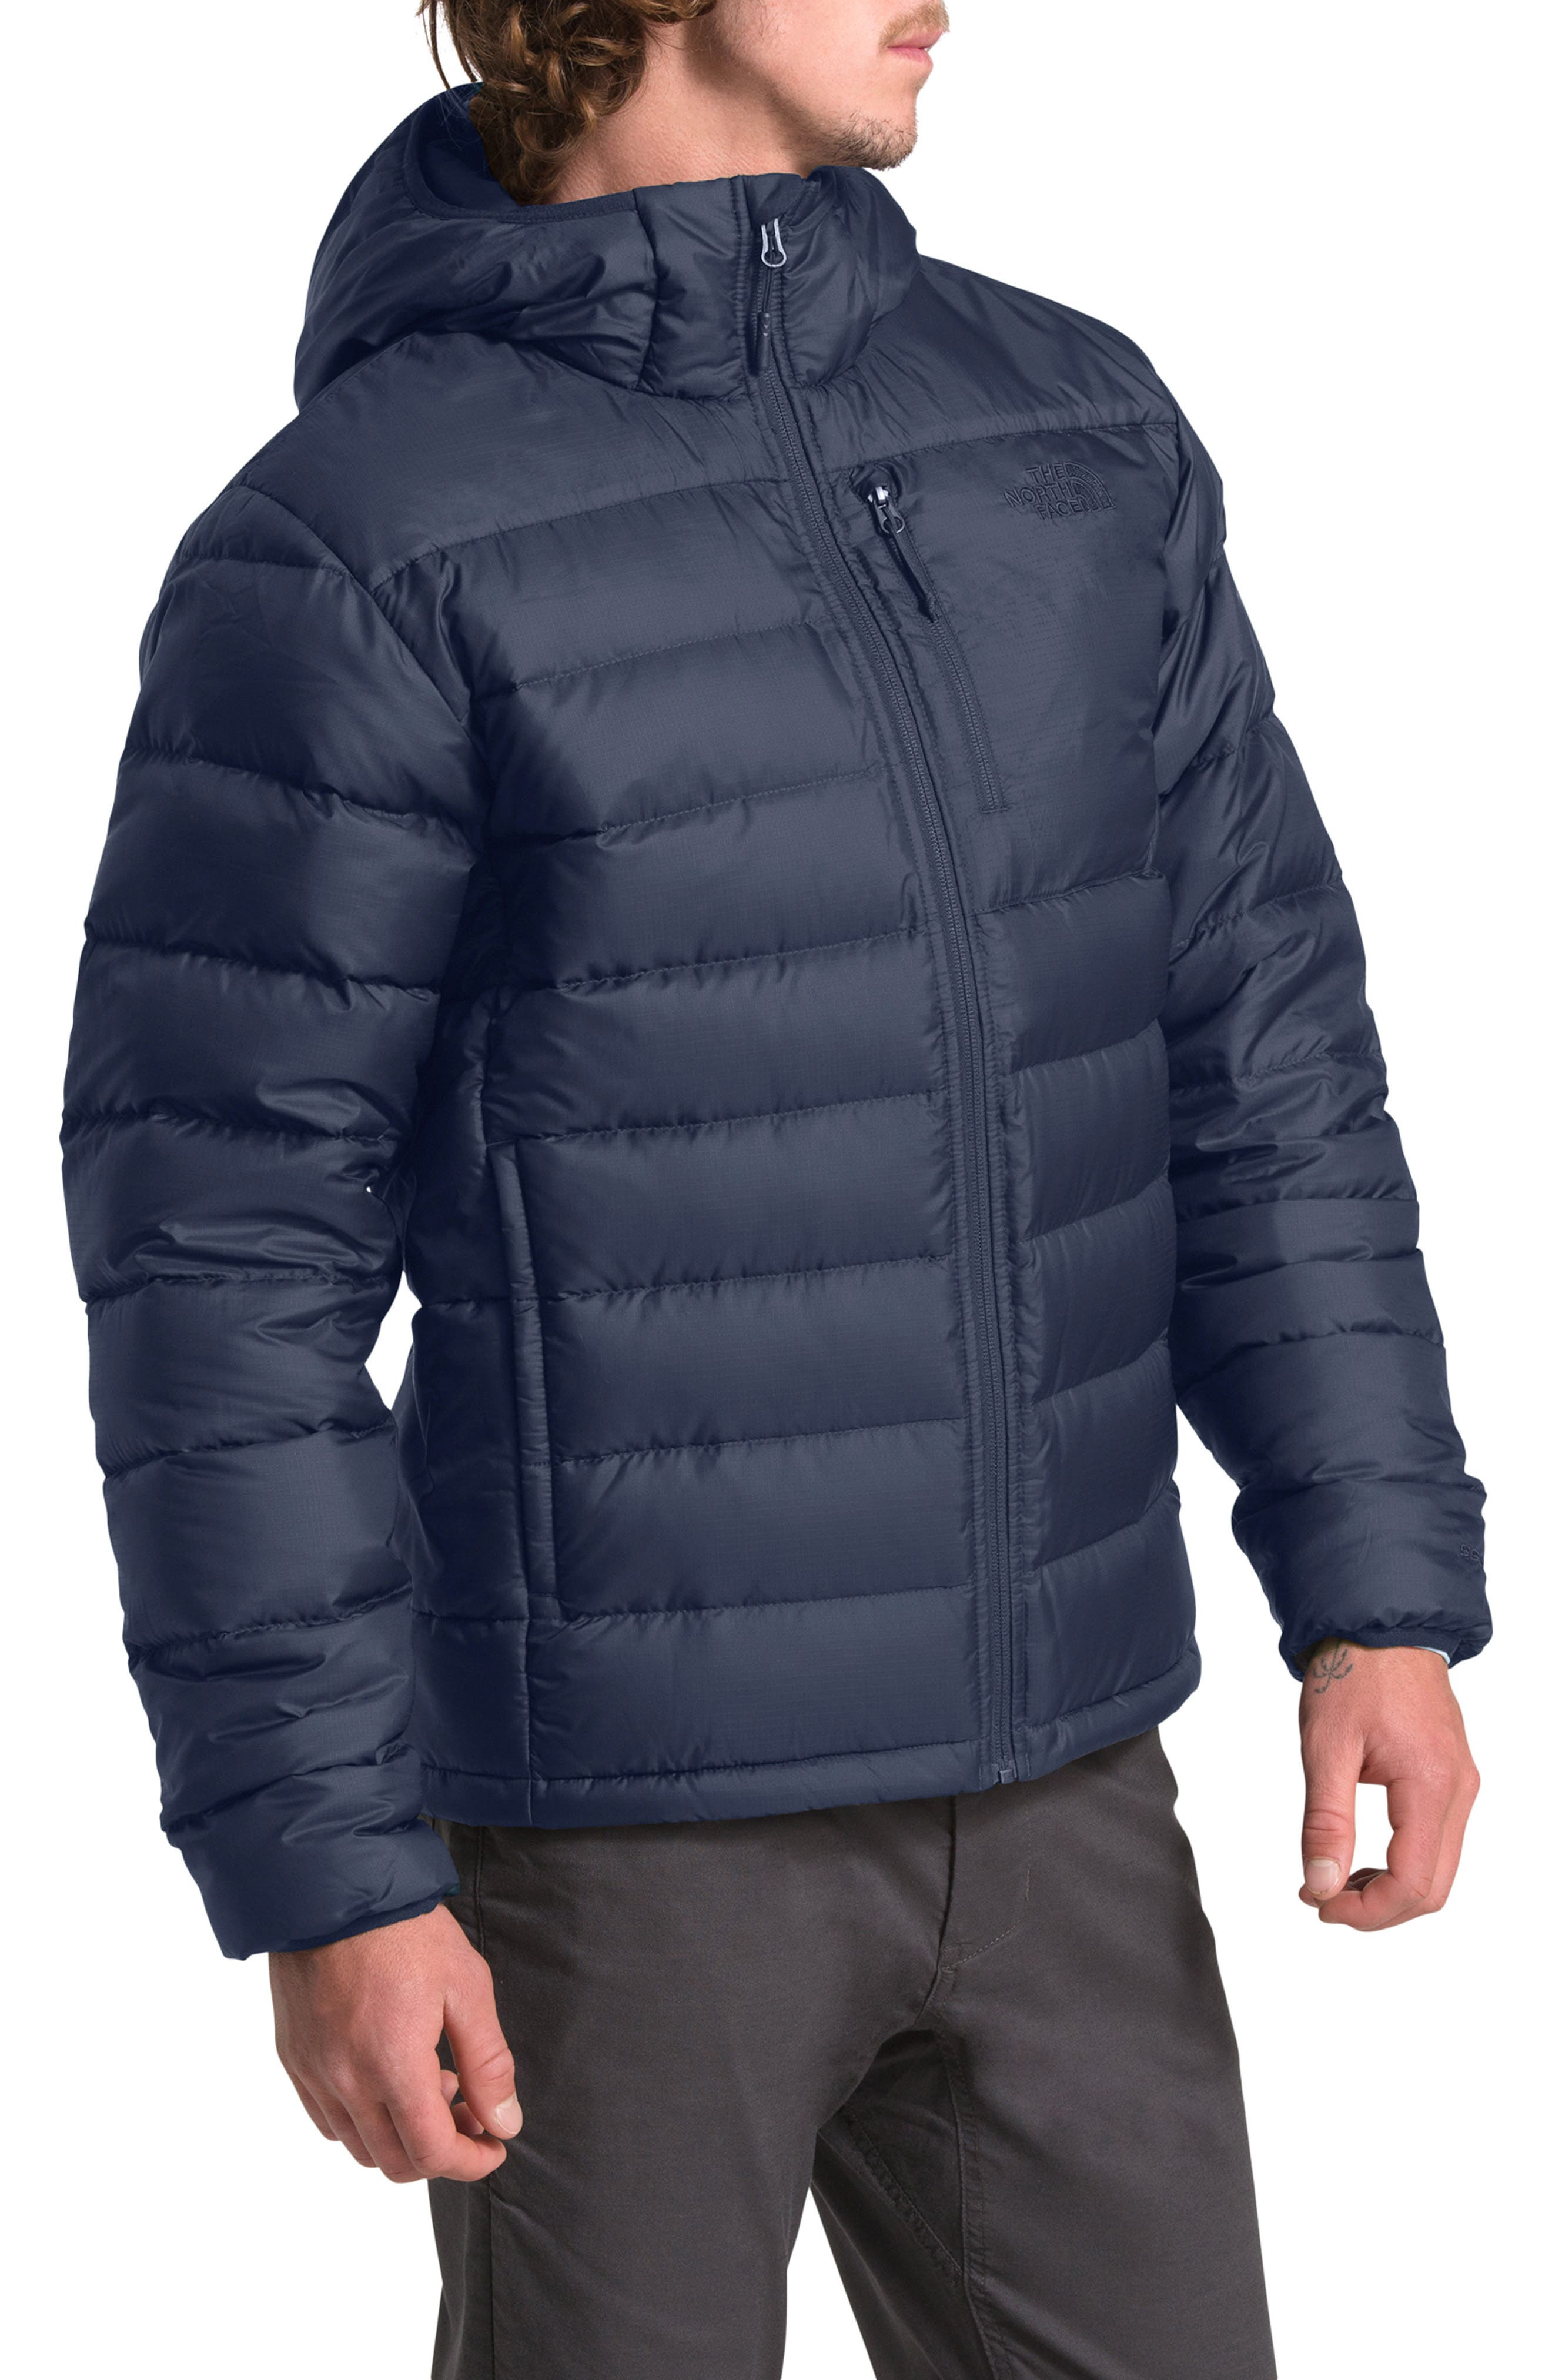 The North Face Mountain Q Jacket Asphalt Grey | Garmentory